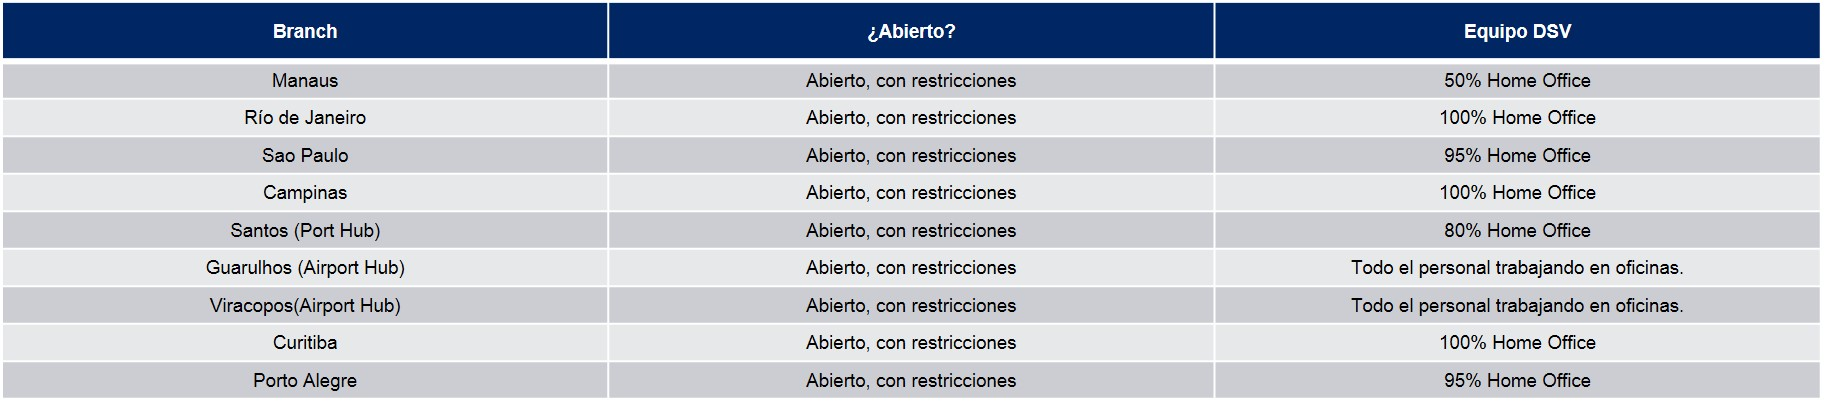 Tabla OperacionesBrasil COVID-19 03-04-20